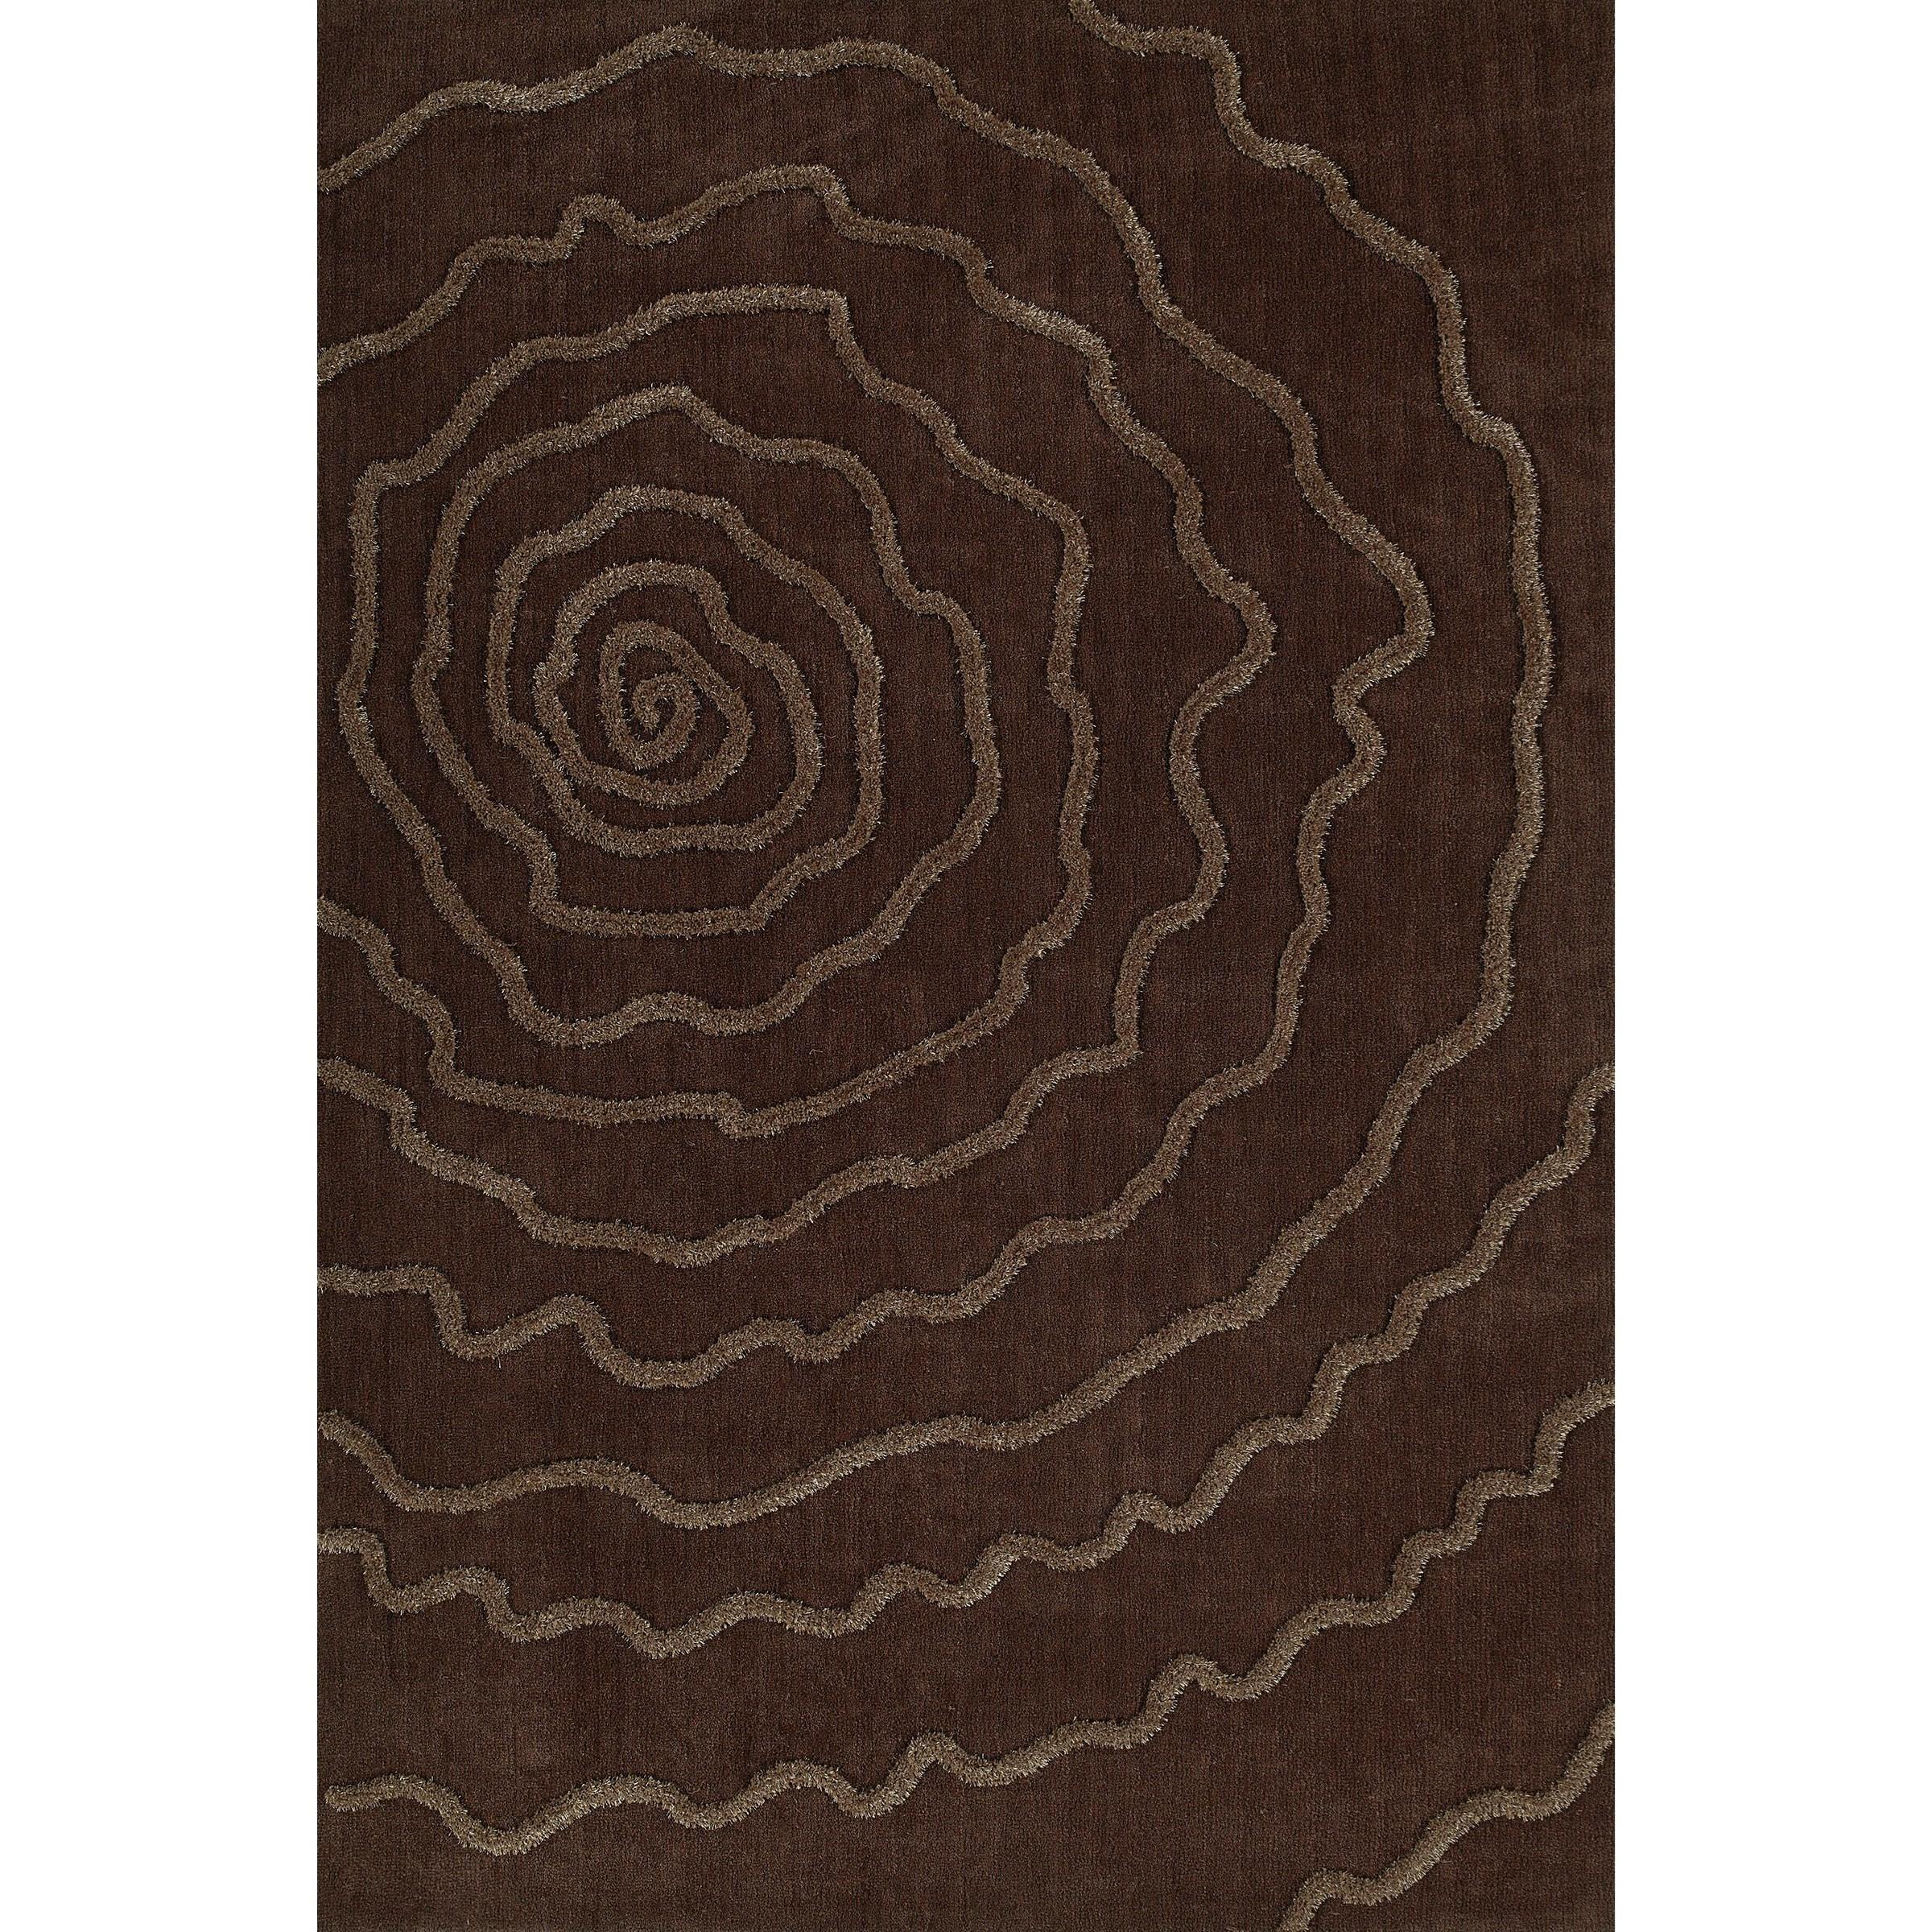 Dakota Chocolate 9'X13' Area Rug by Dalyn at Fashion Furniture